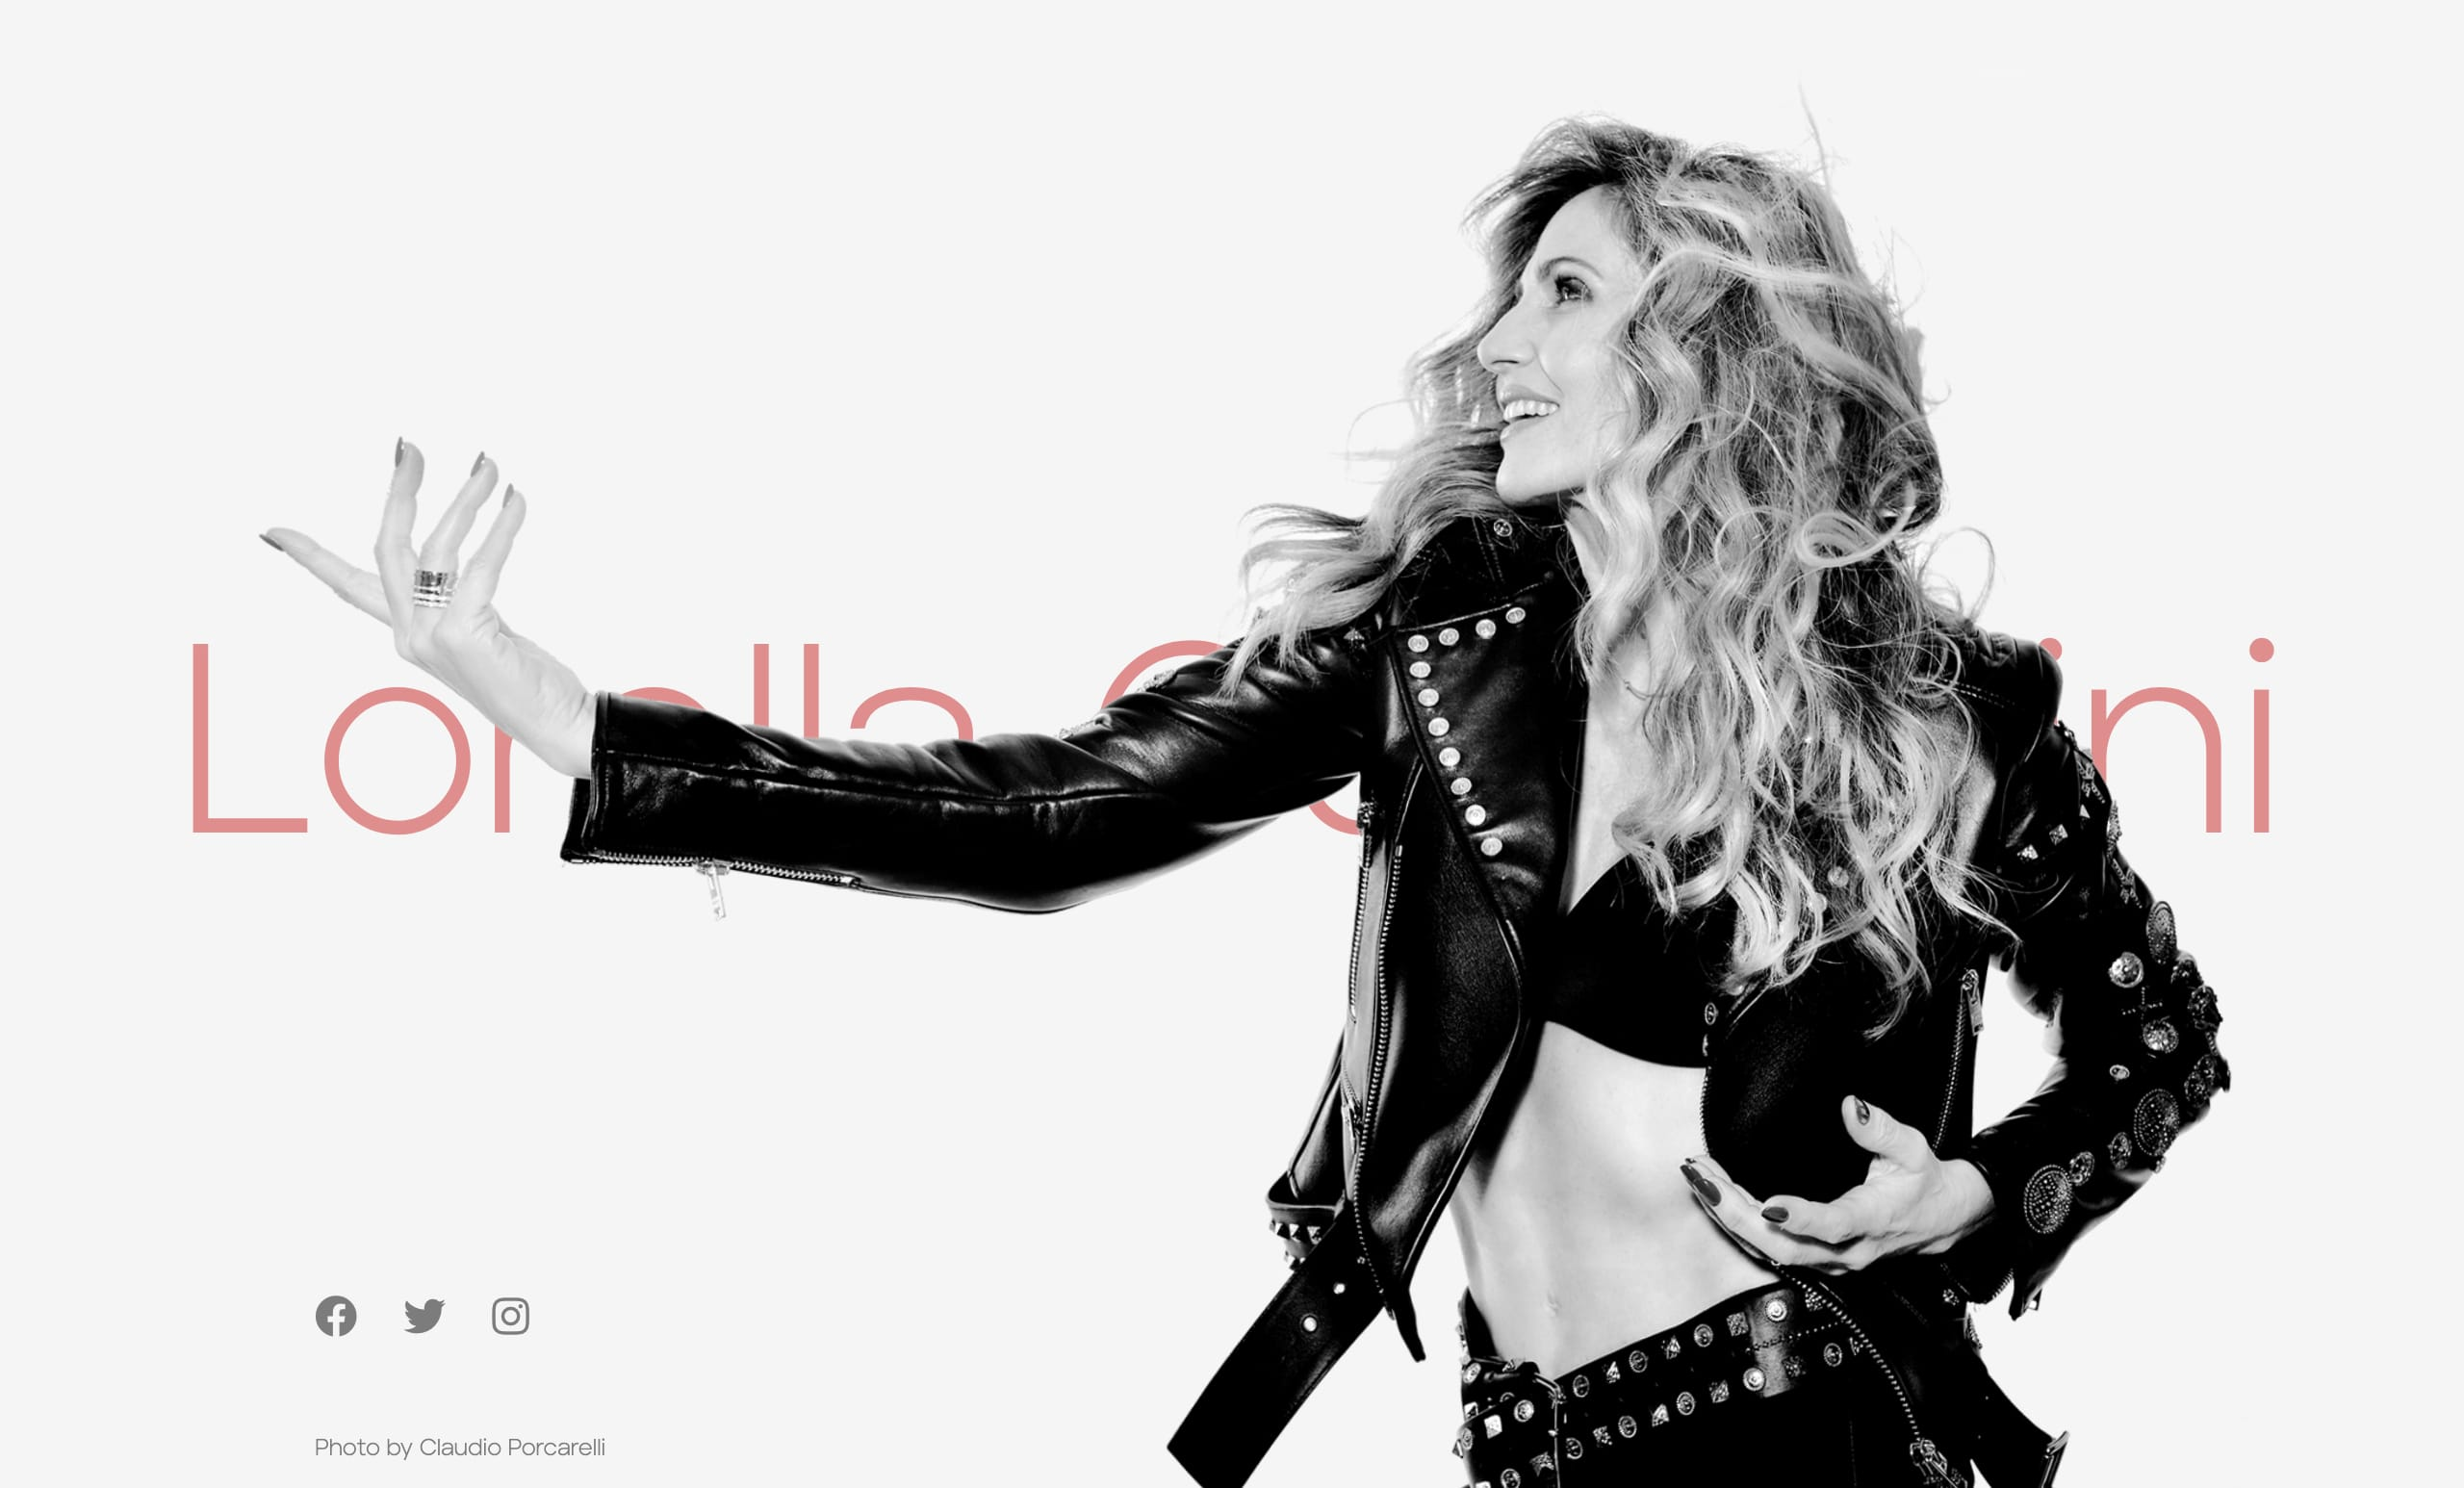 Lorella Cuccarini Website Screenshot